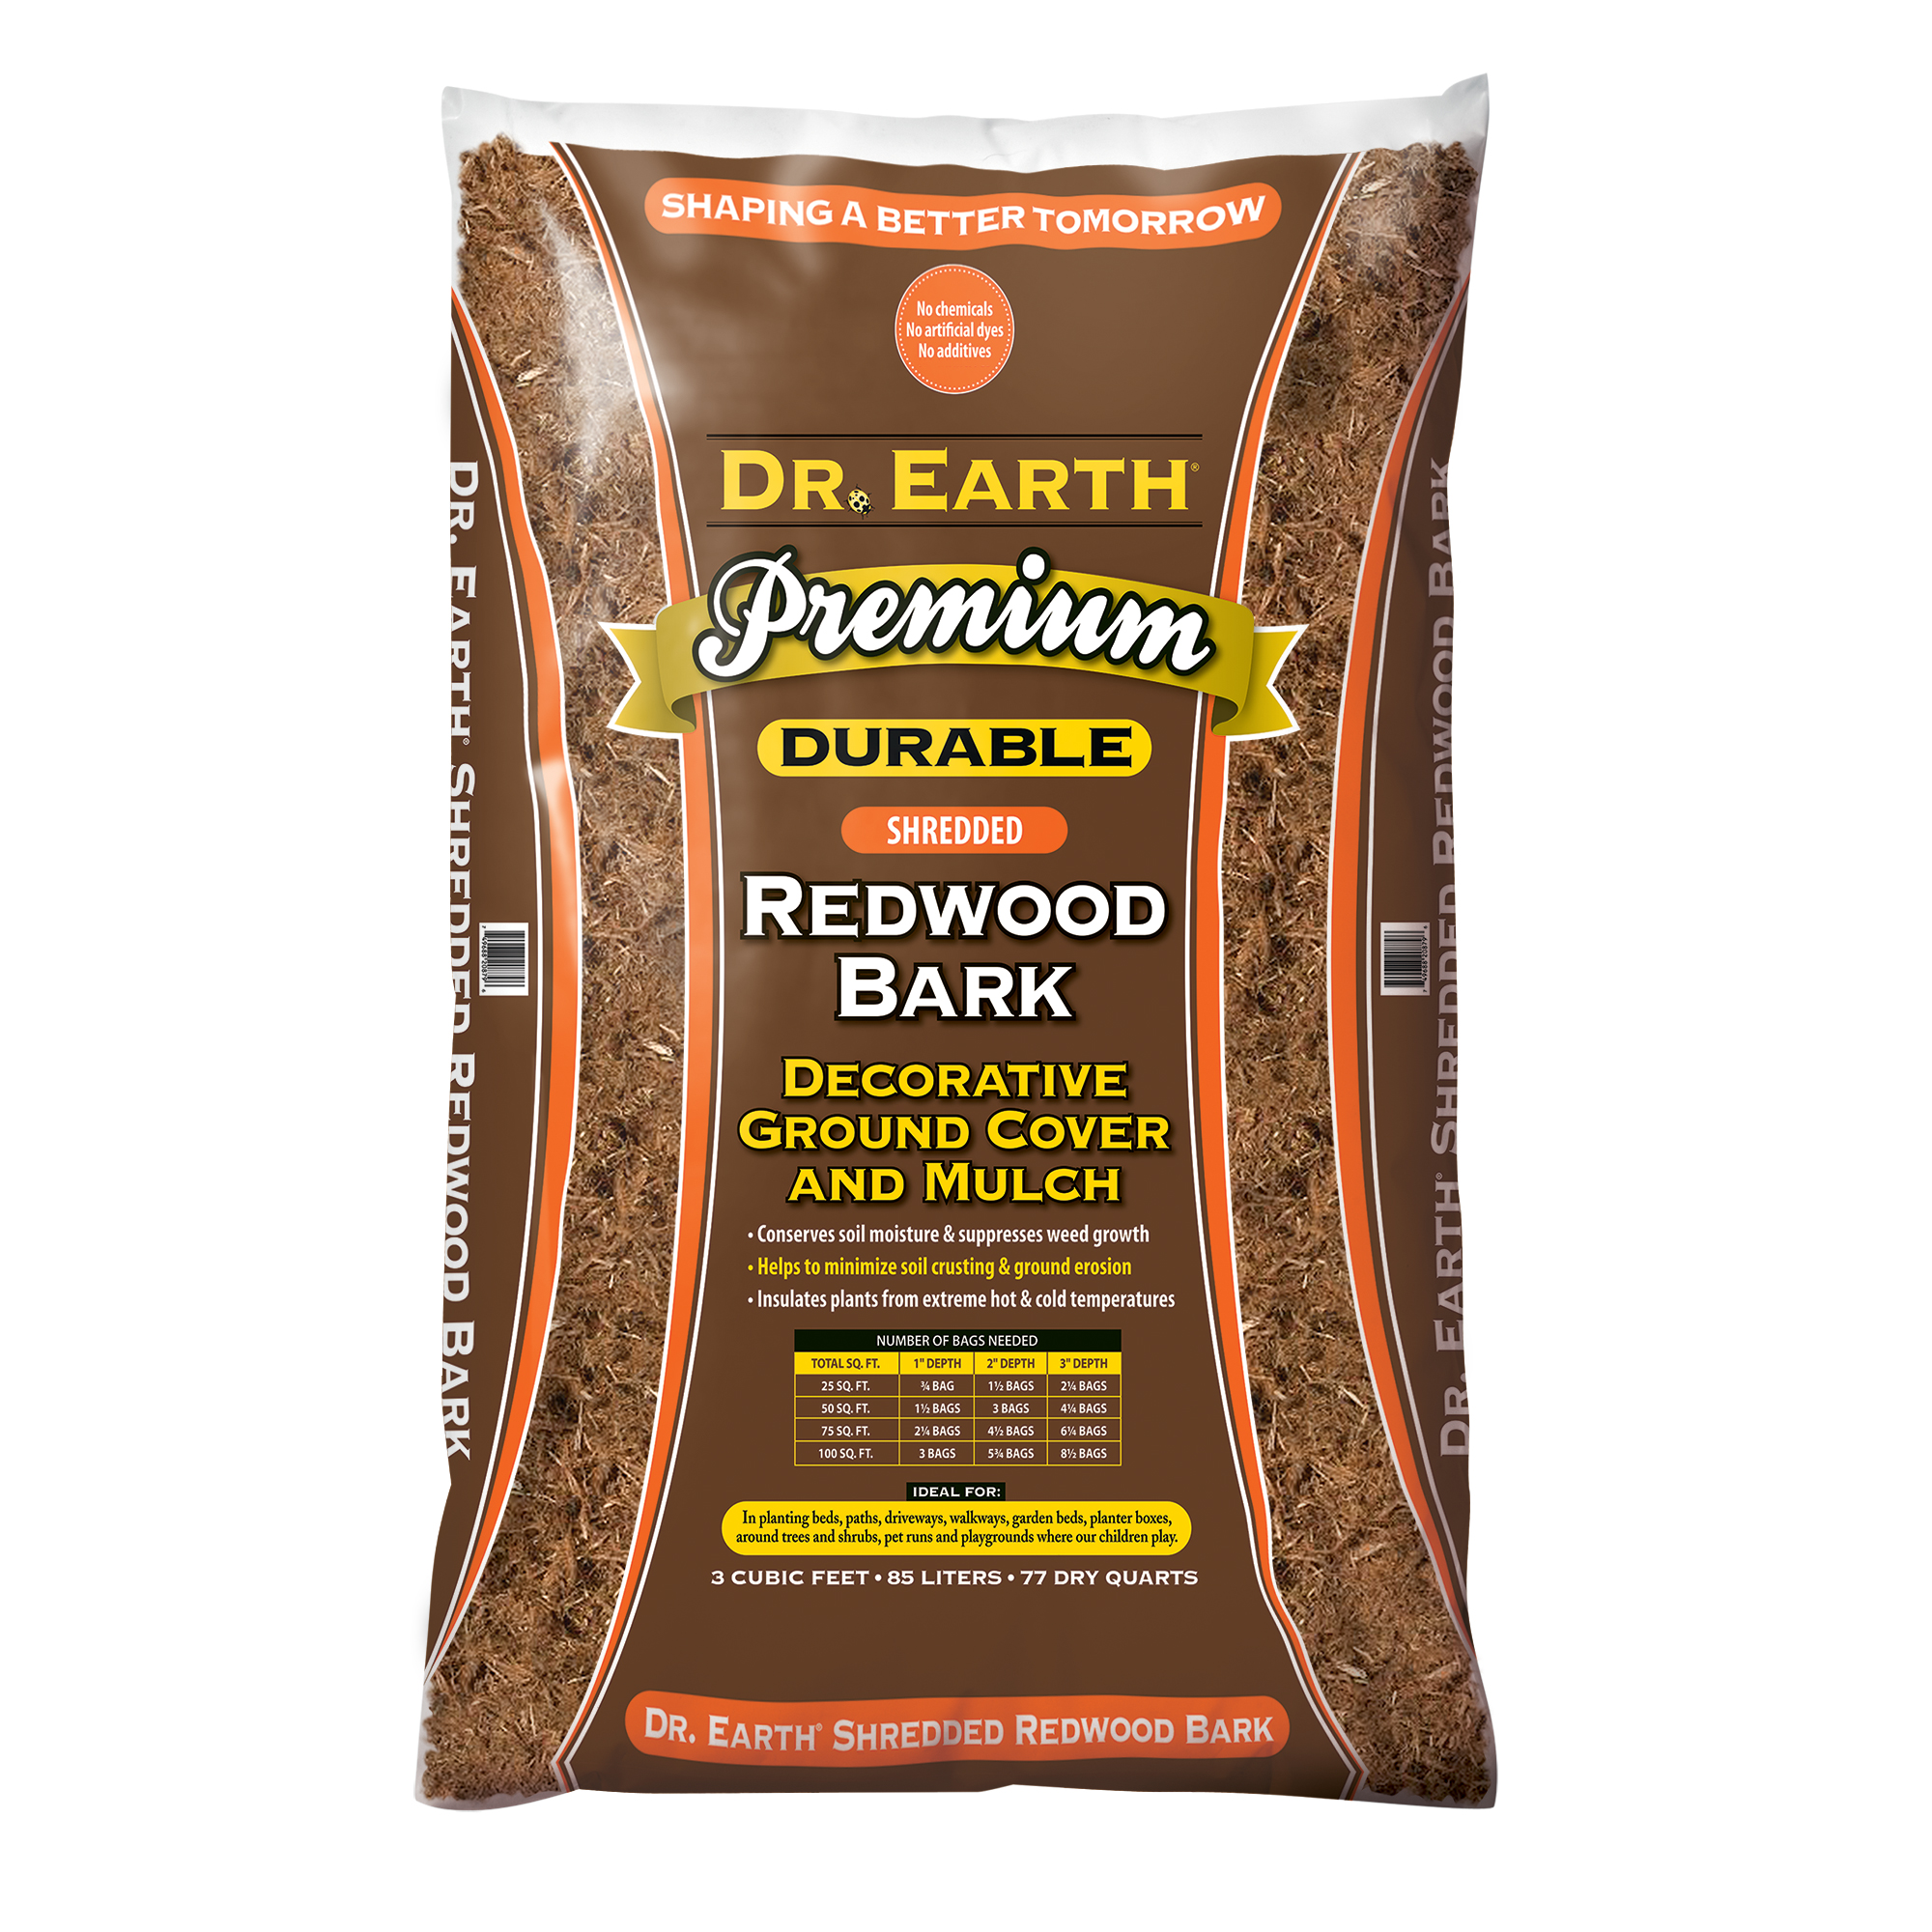 Dr Earth Premium Shredded Redwood Bark Decorative Ground Cover